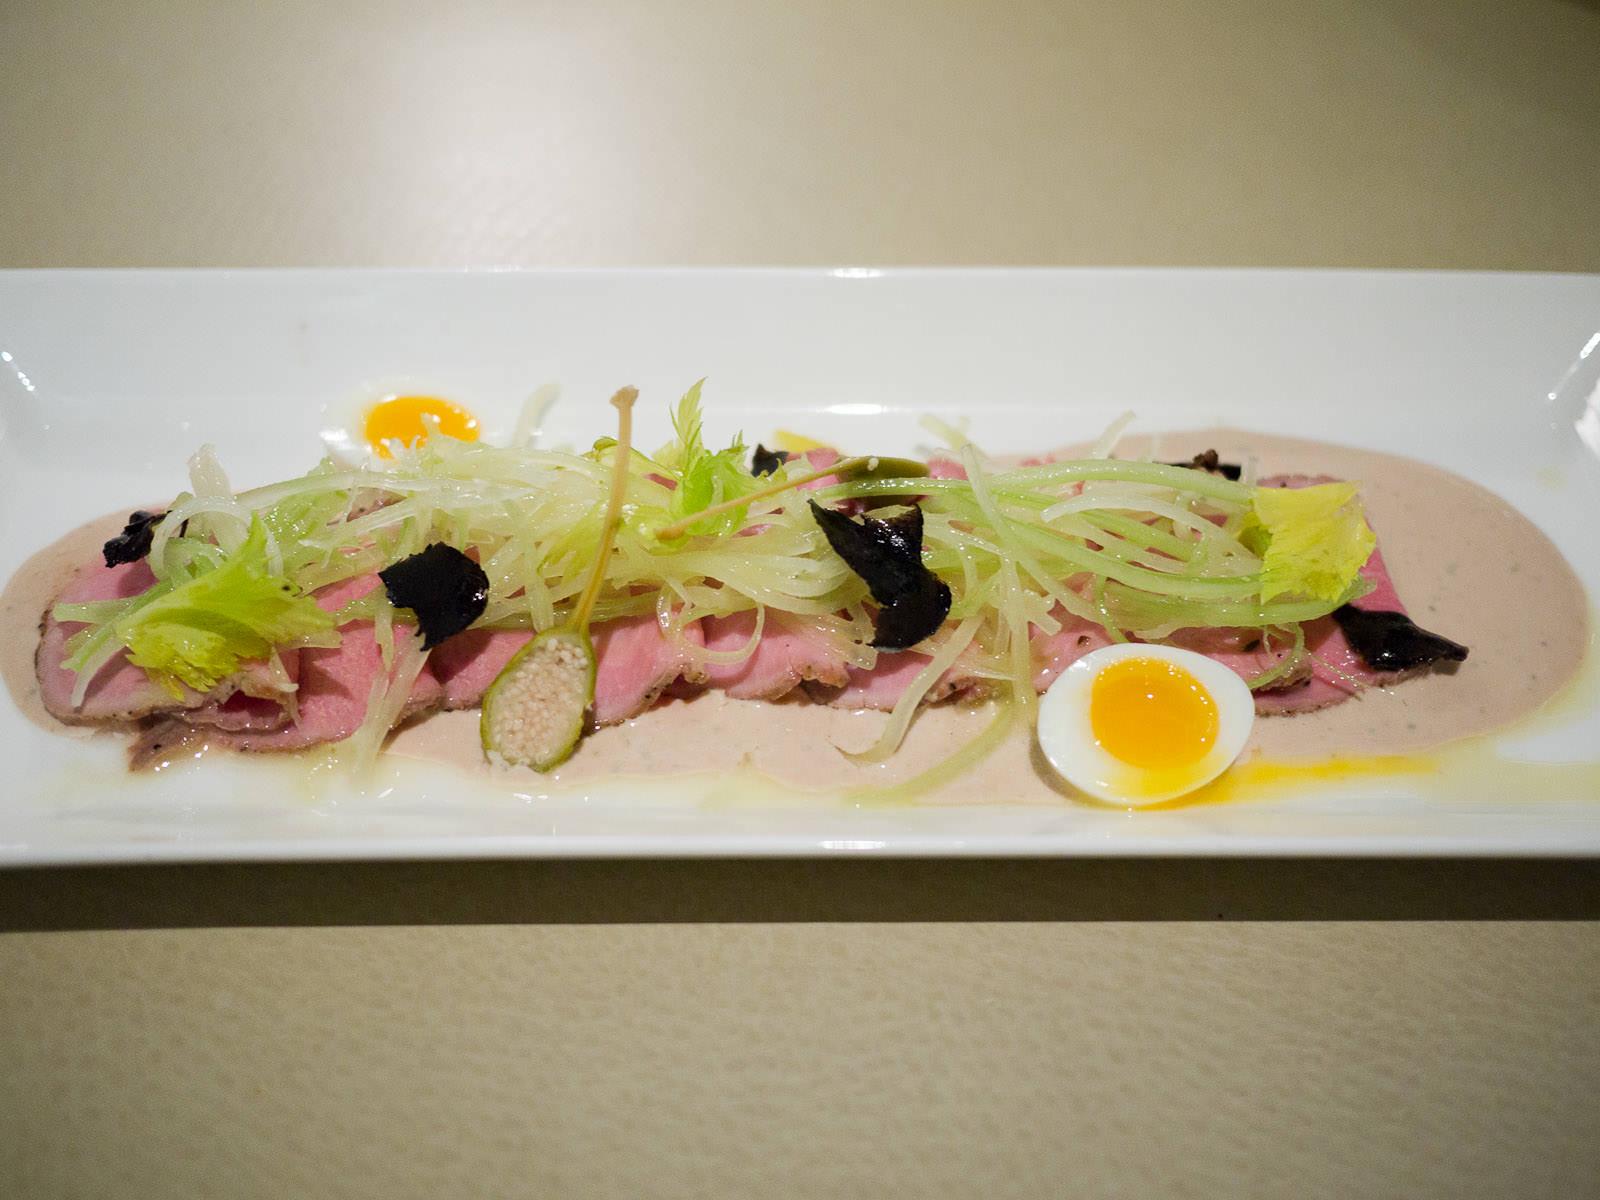 Roasted veal in tuna caper sauce with crispy celery salad, quail egg, black truffle, AU$25